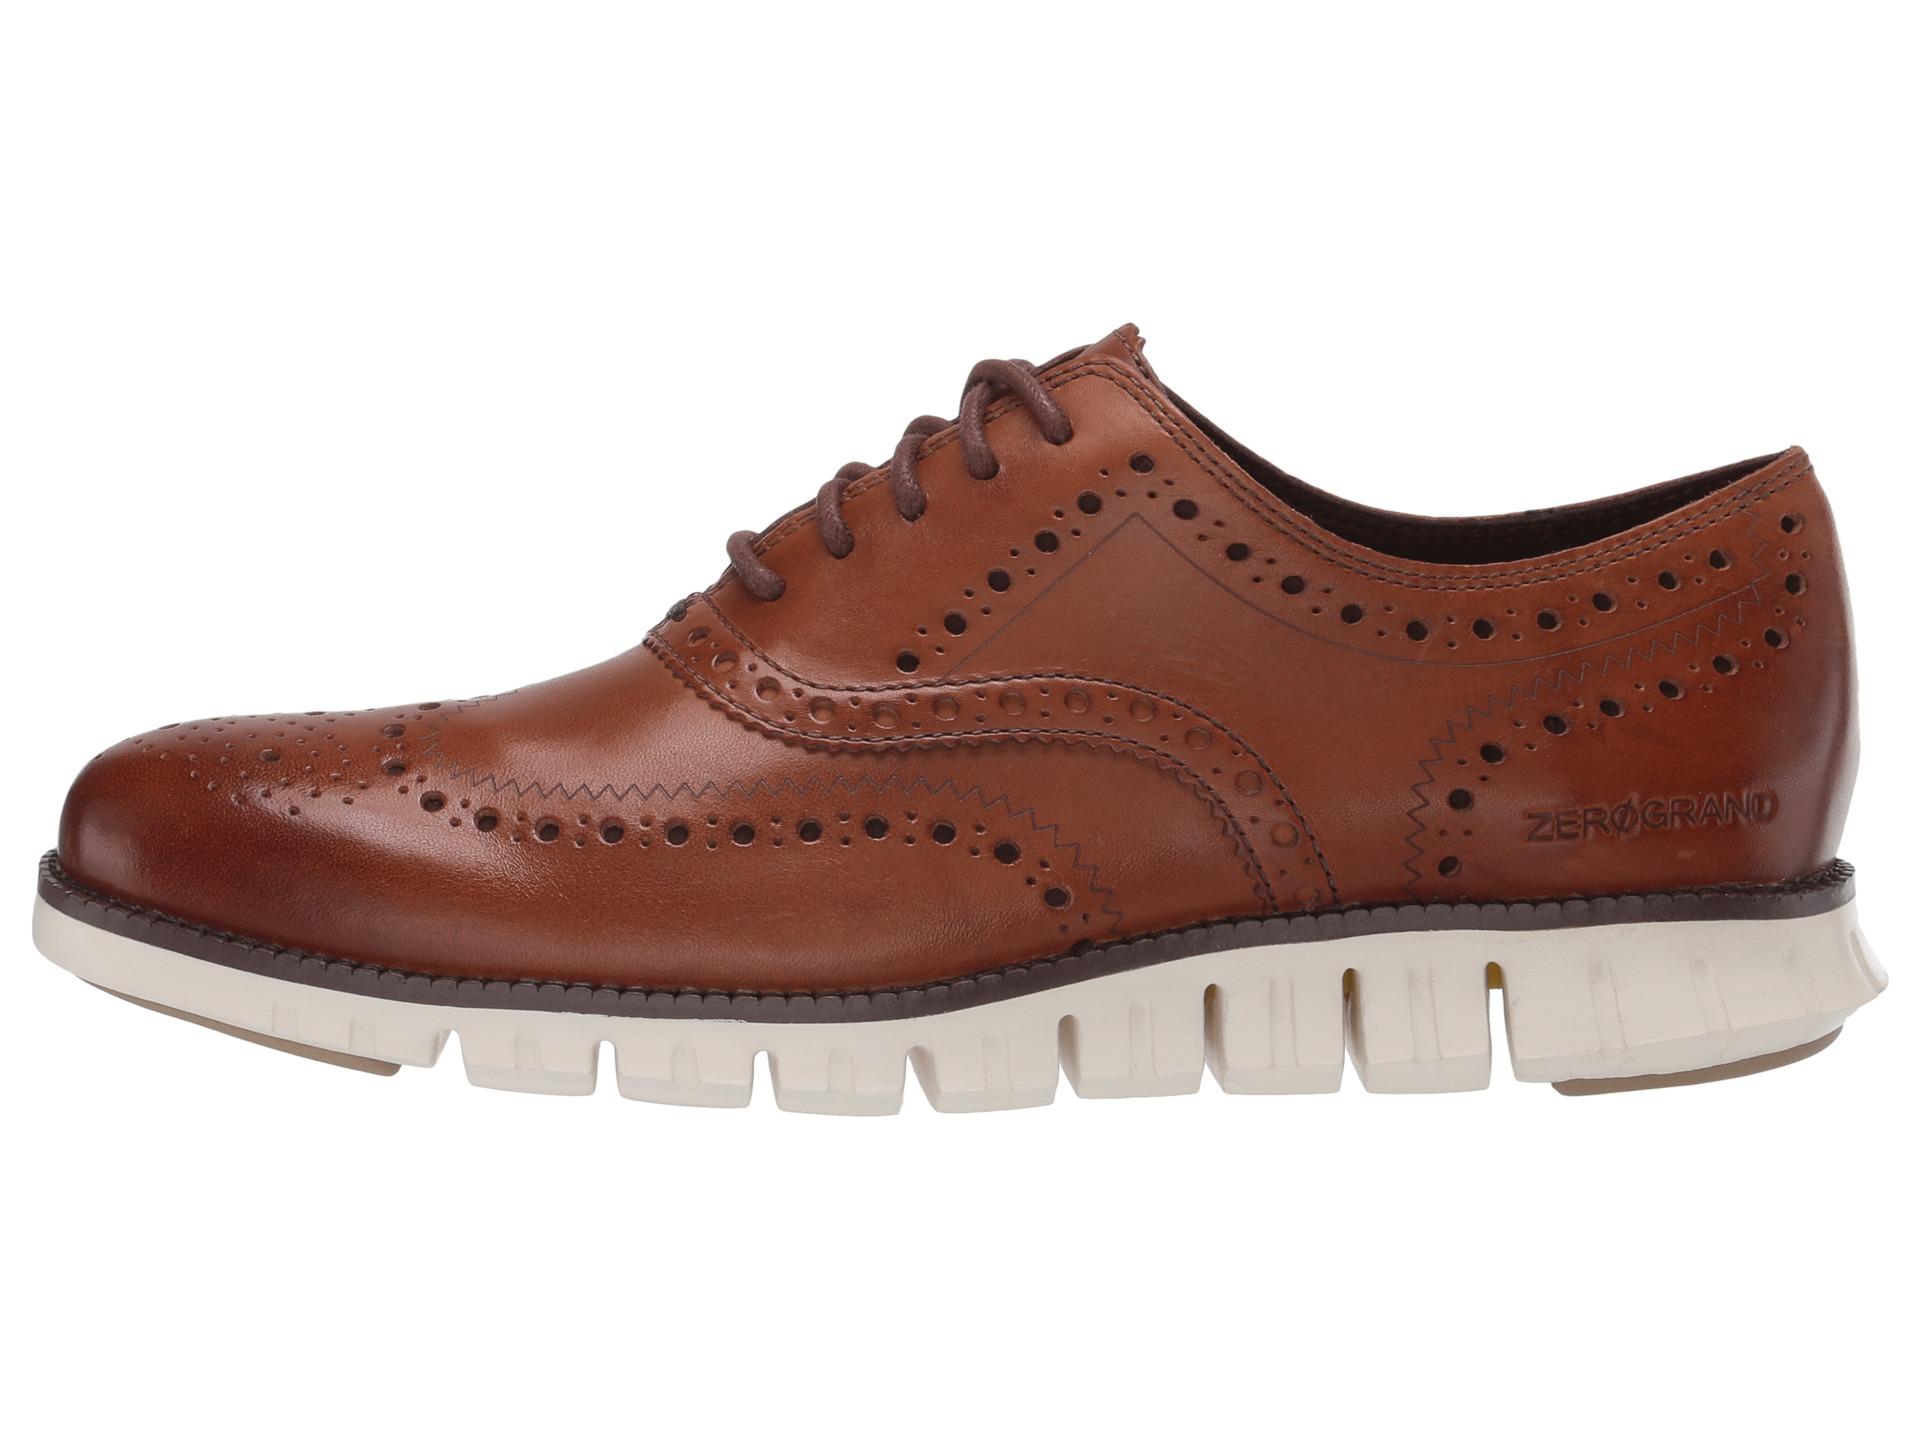 Cole Haan Women S Shoes M